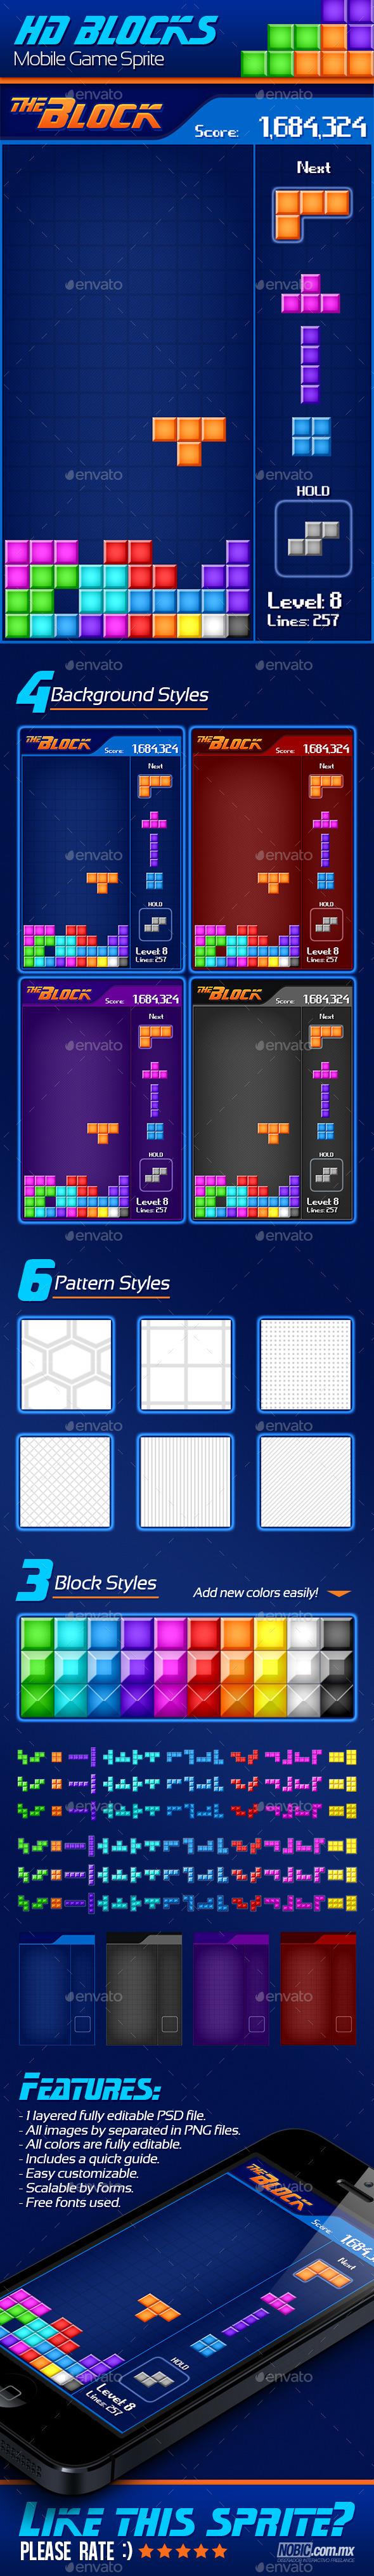 Tetris Mobile Game Sprite